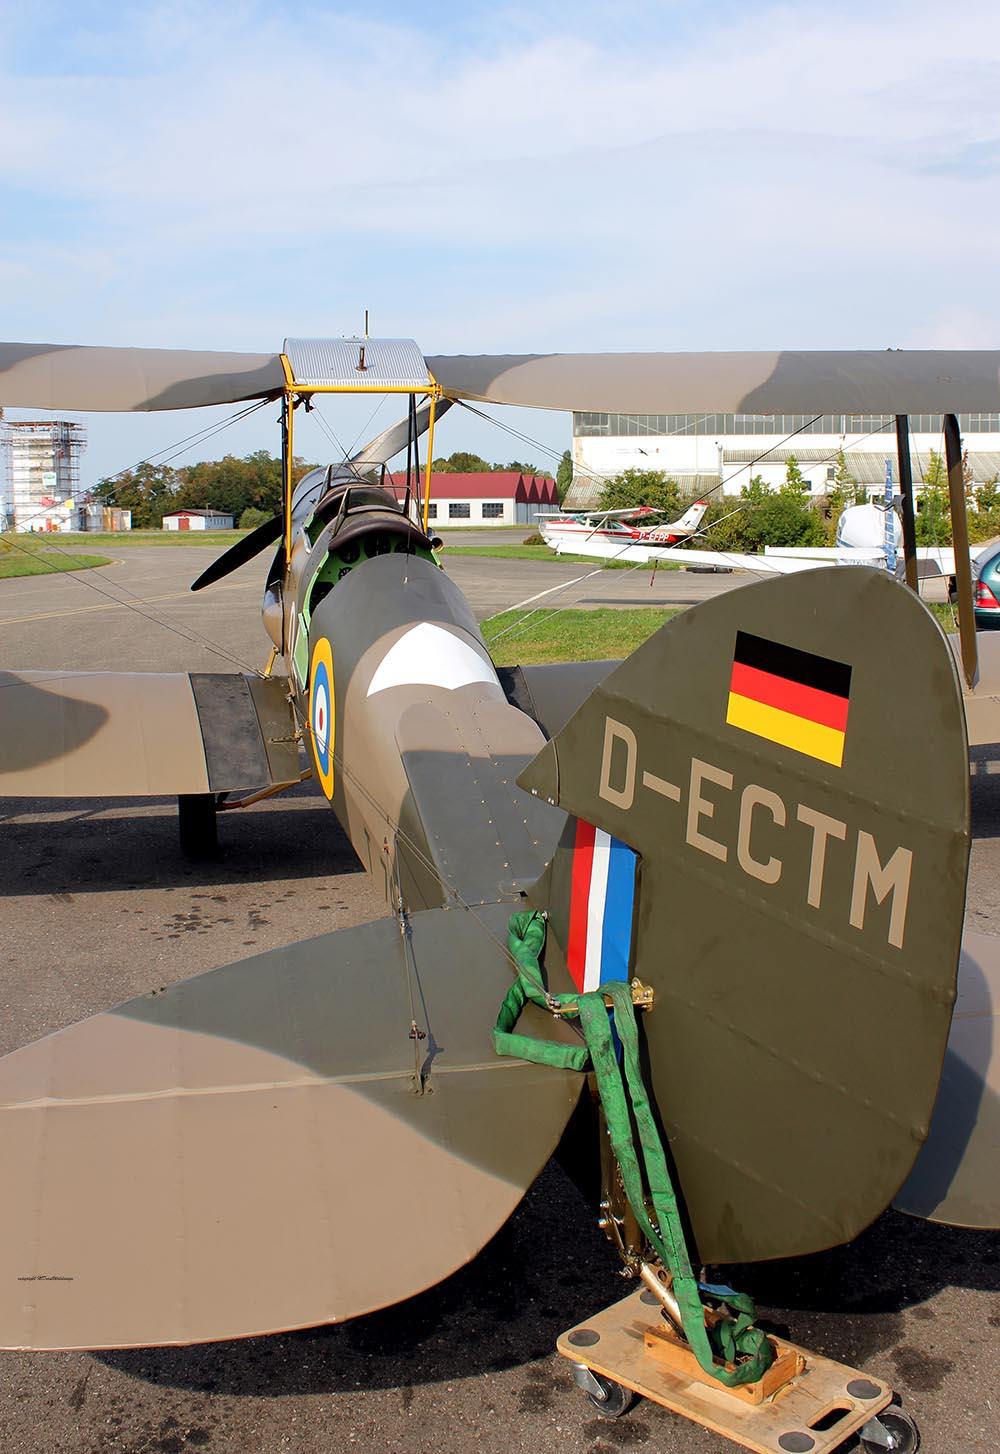 De_Havilland_TigerMoth_D-ECTM_2011-08-256.jpg